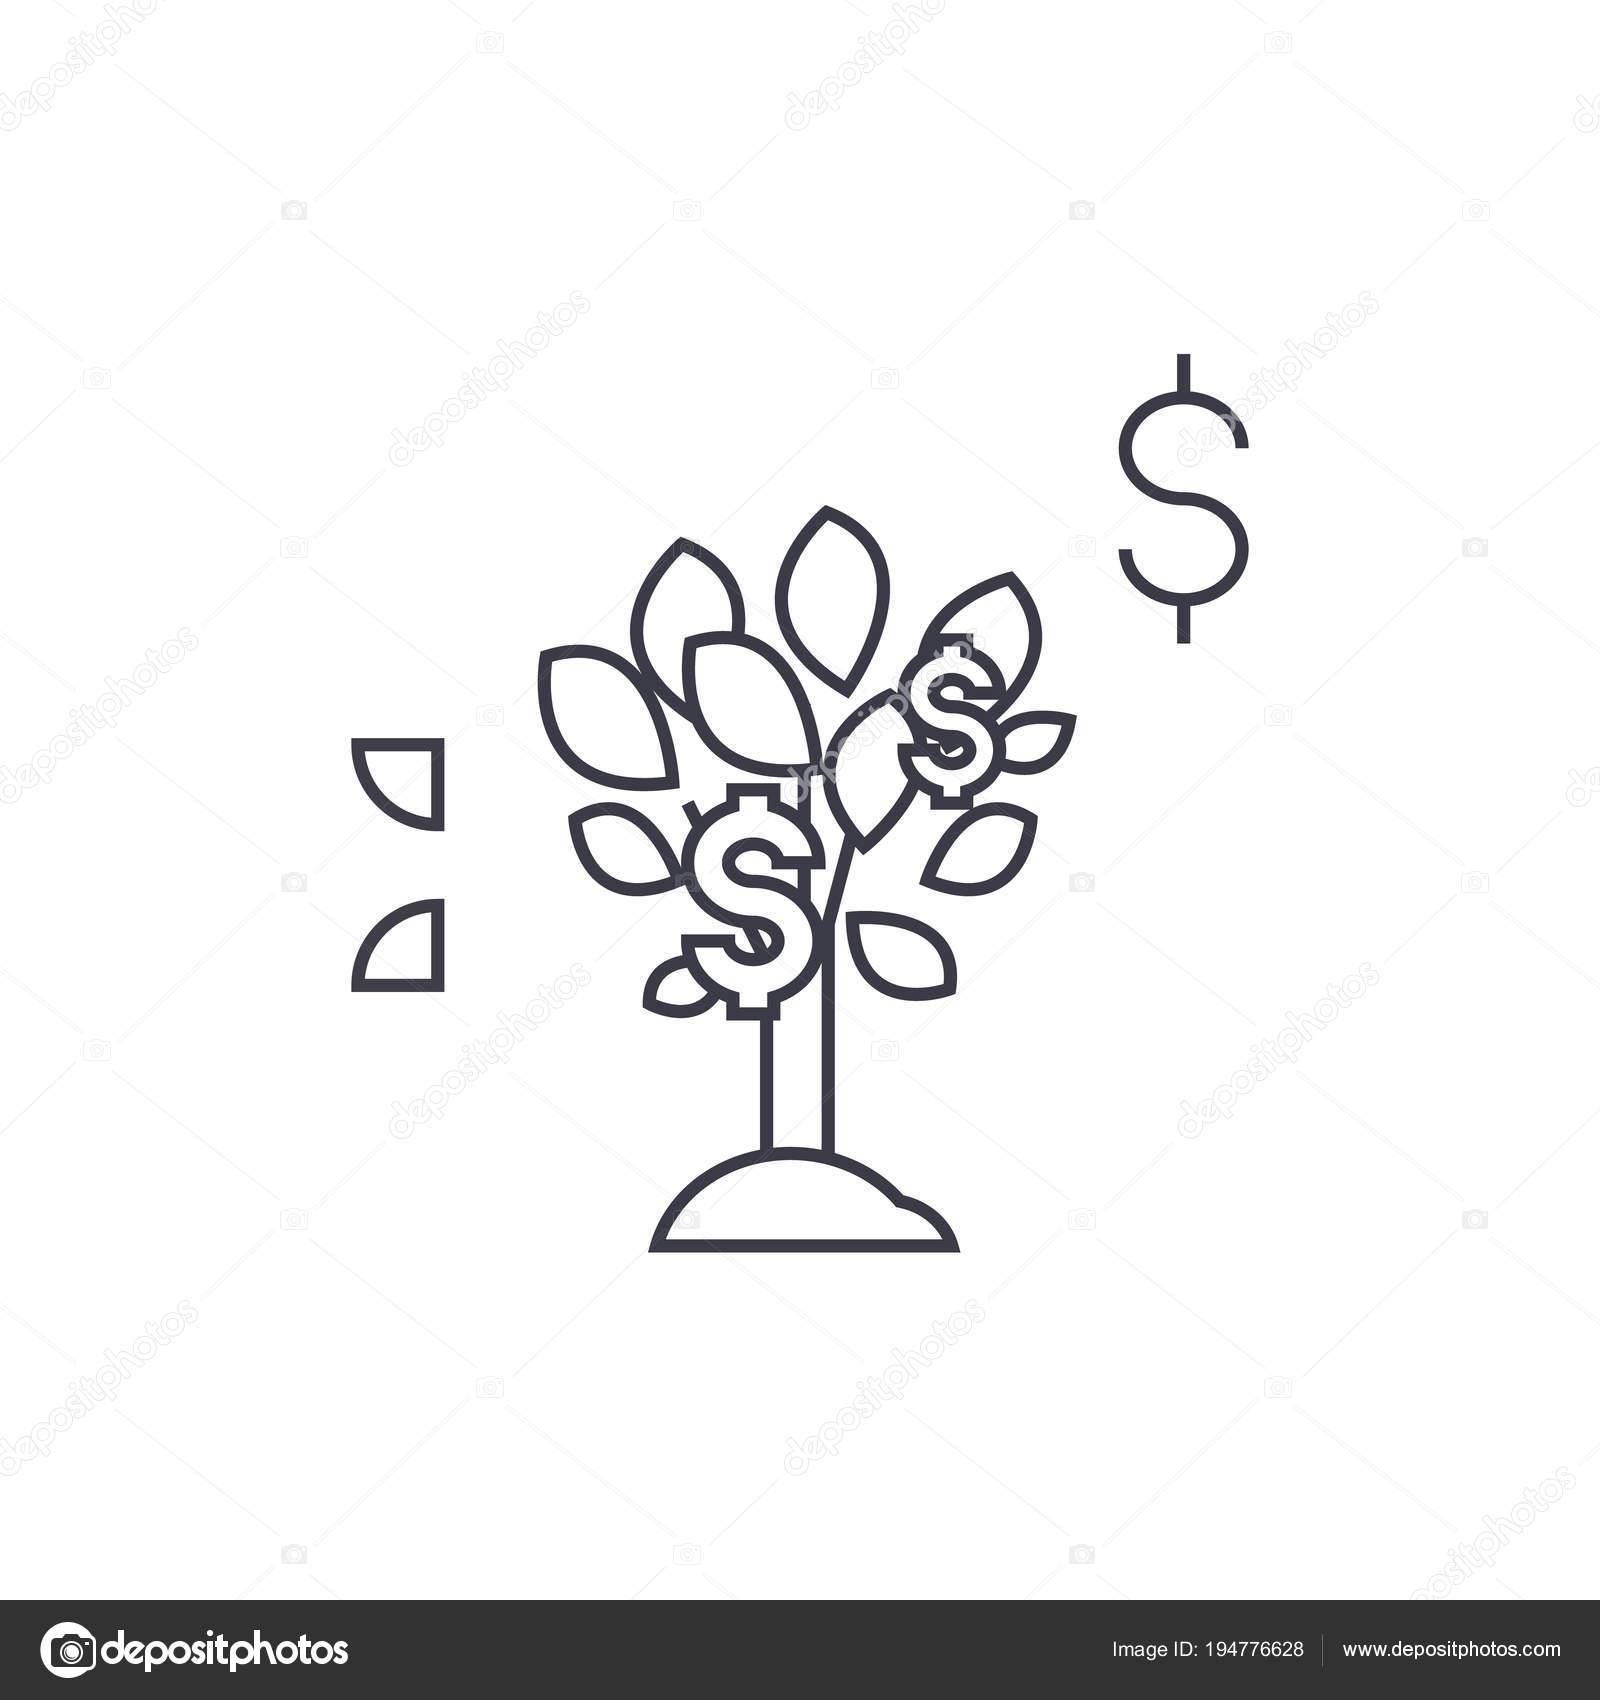 Dollar Tree Vector Line Icon Sign Illustration On Background Editable Strokes Stock